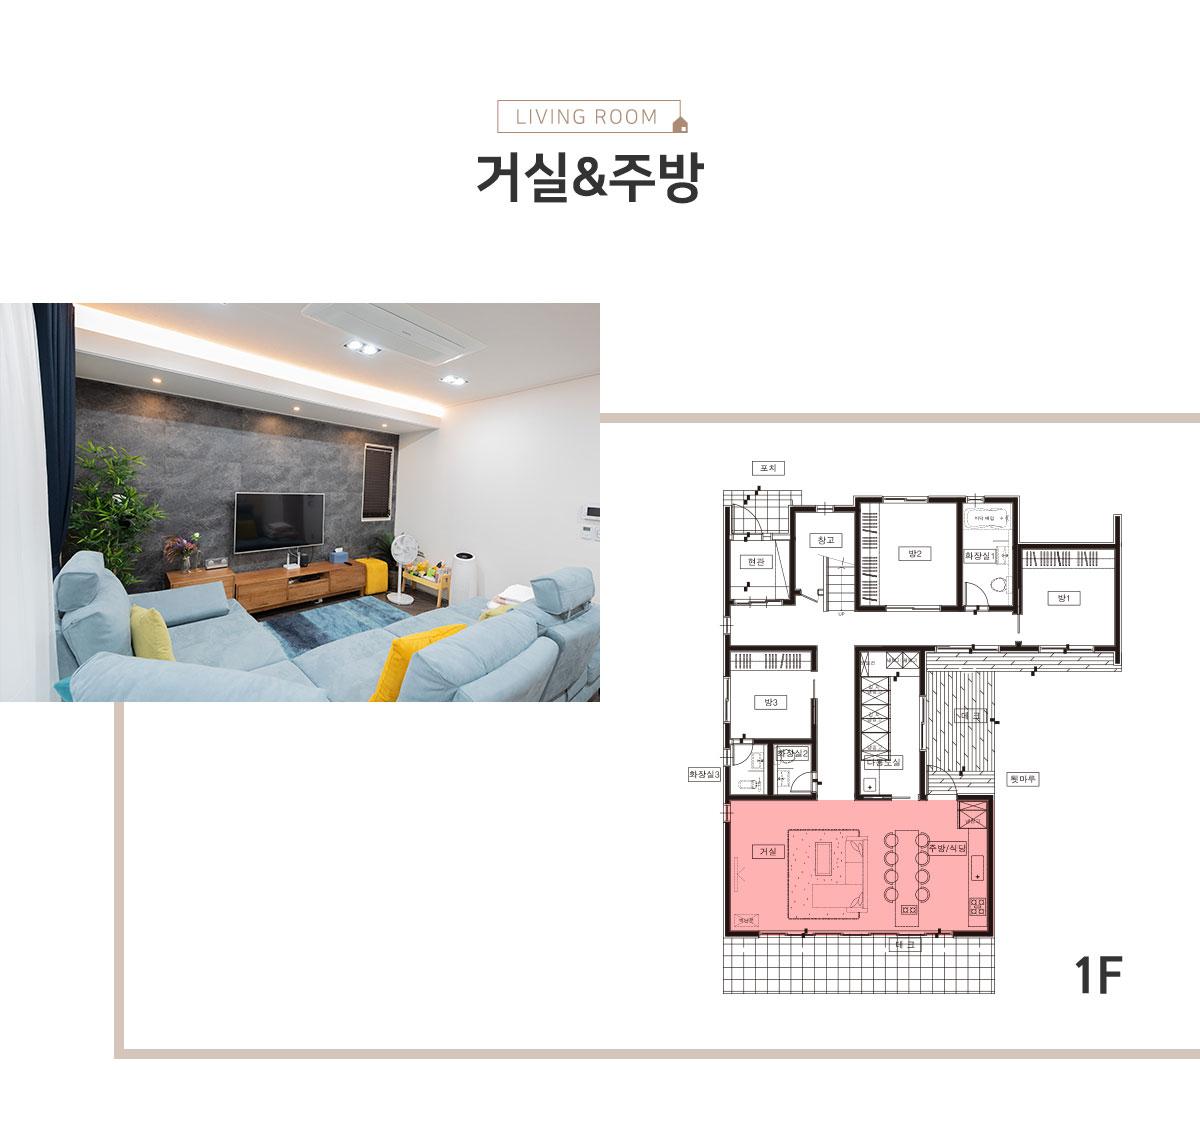 003_living-room_화성남양읍_조항진_01.jpg